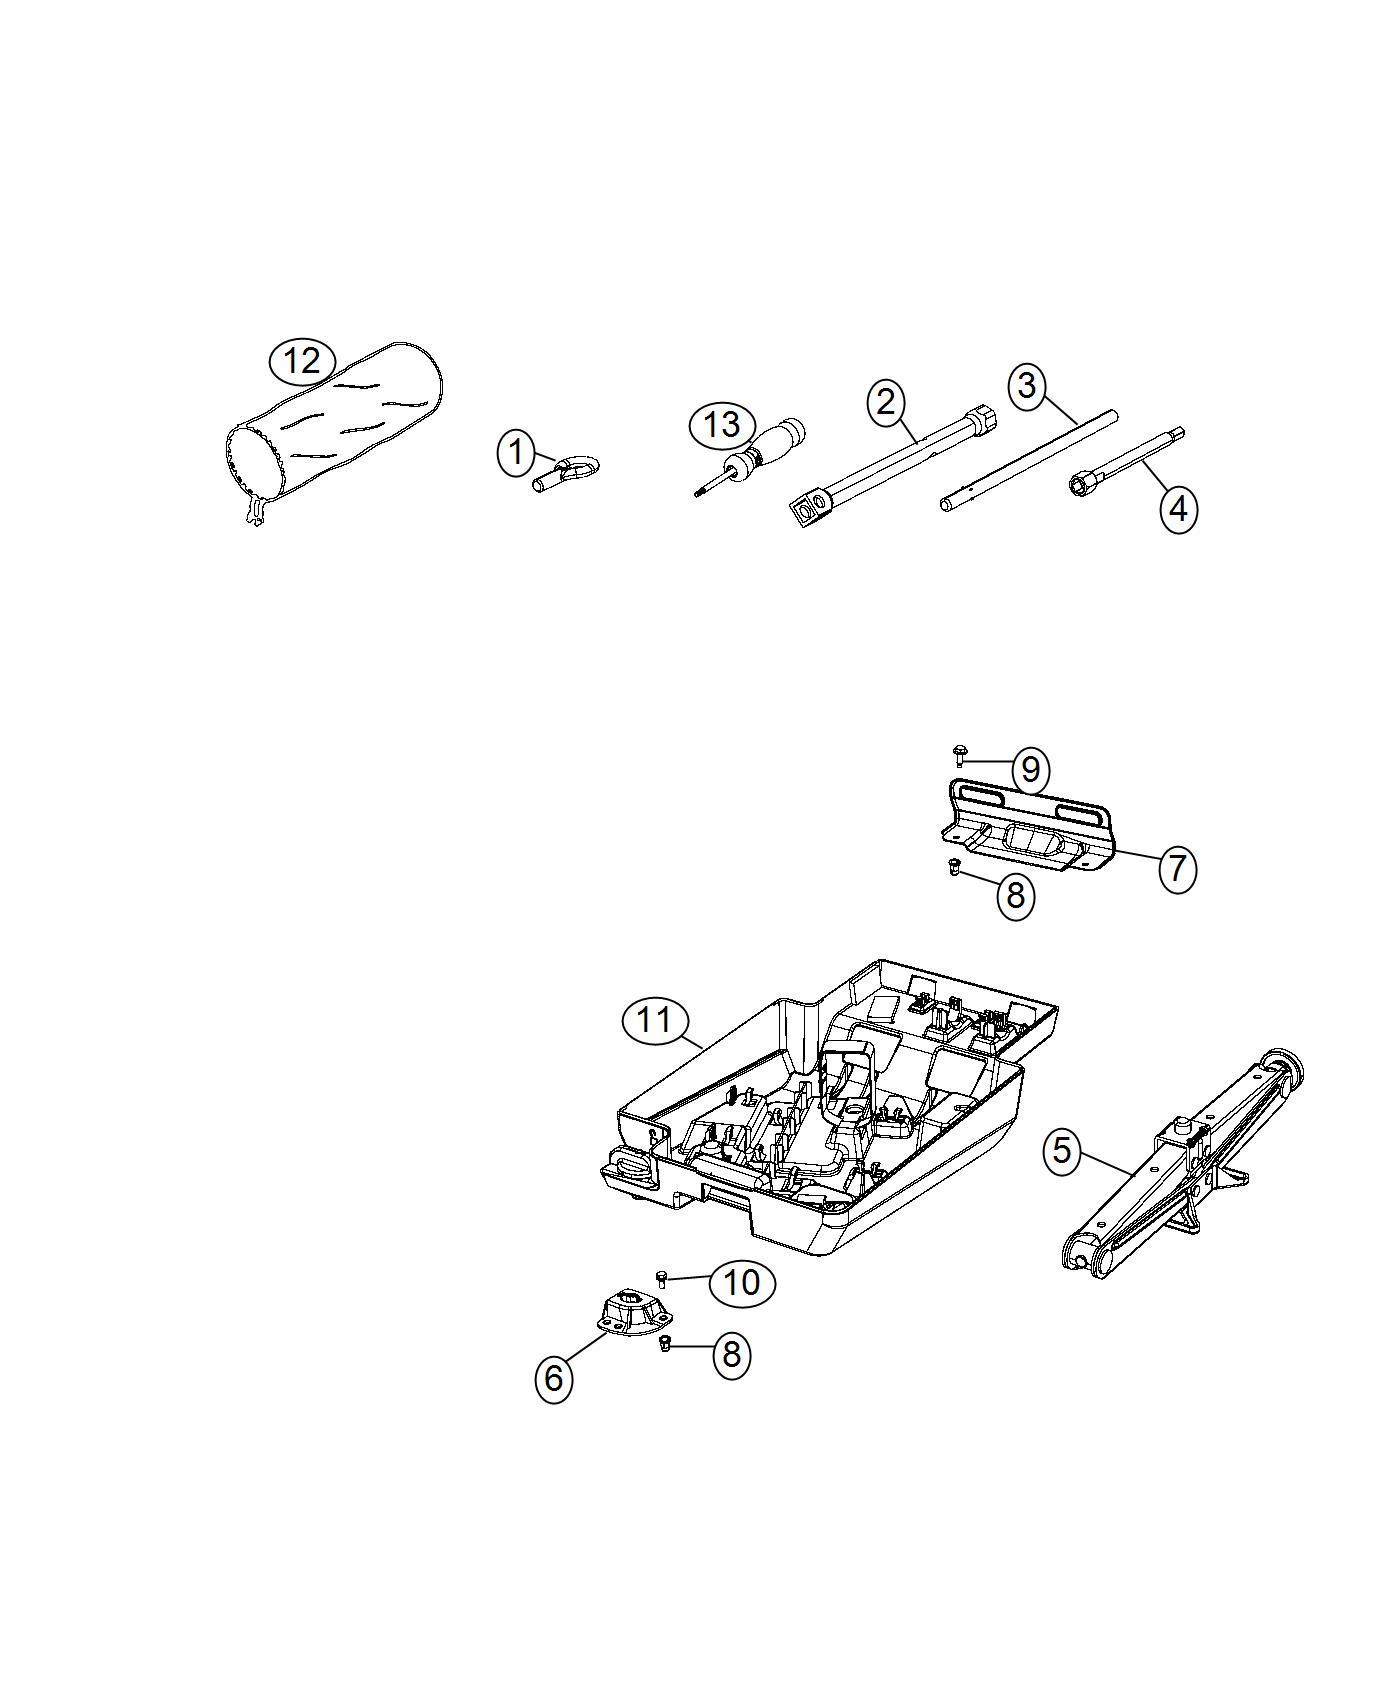 Ram Promaster Wrench Wheel Lug Nut Driver Swivel Seat